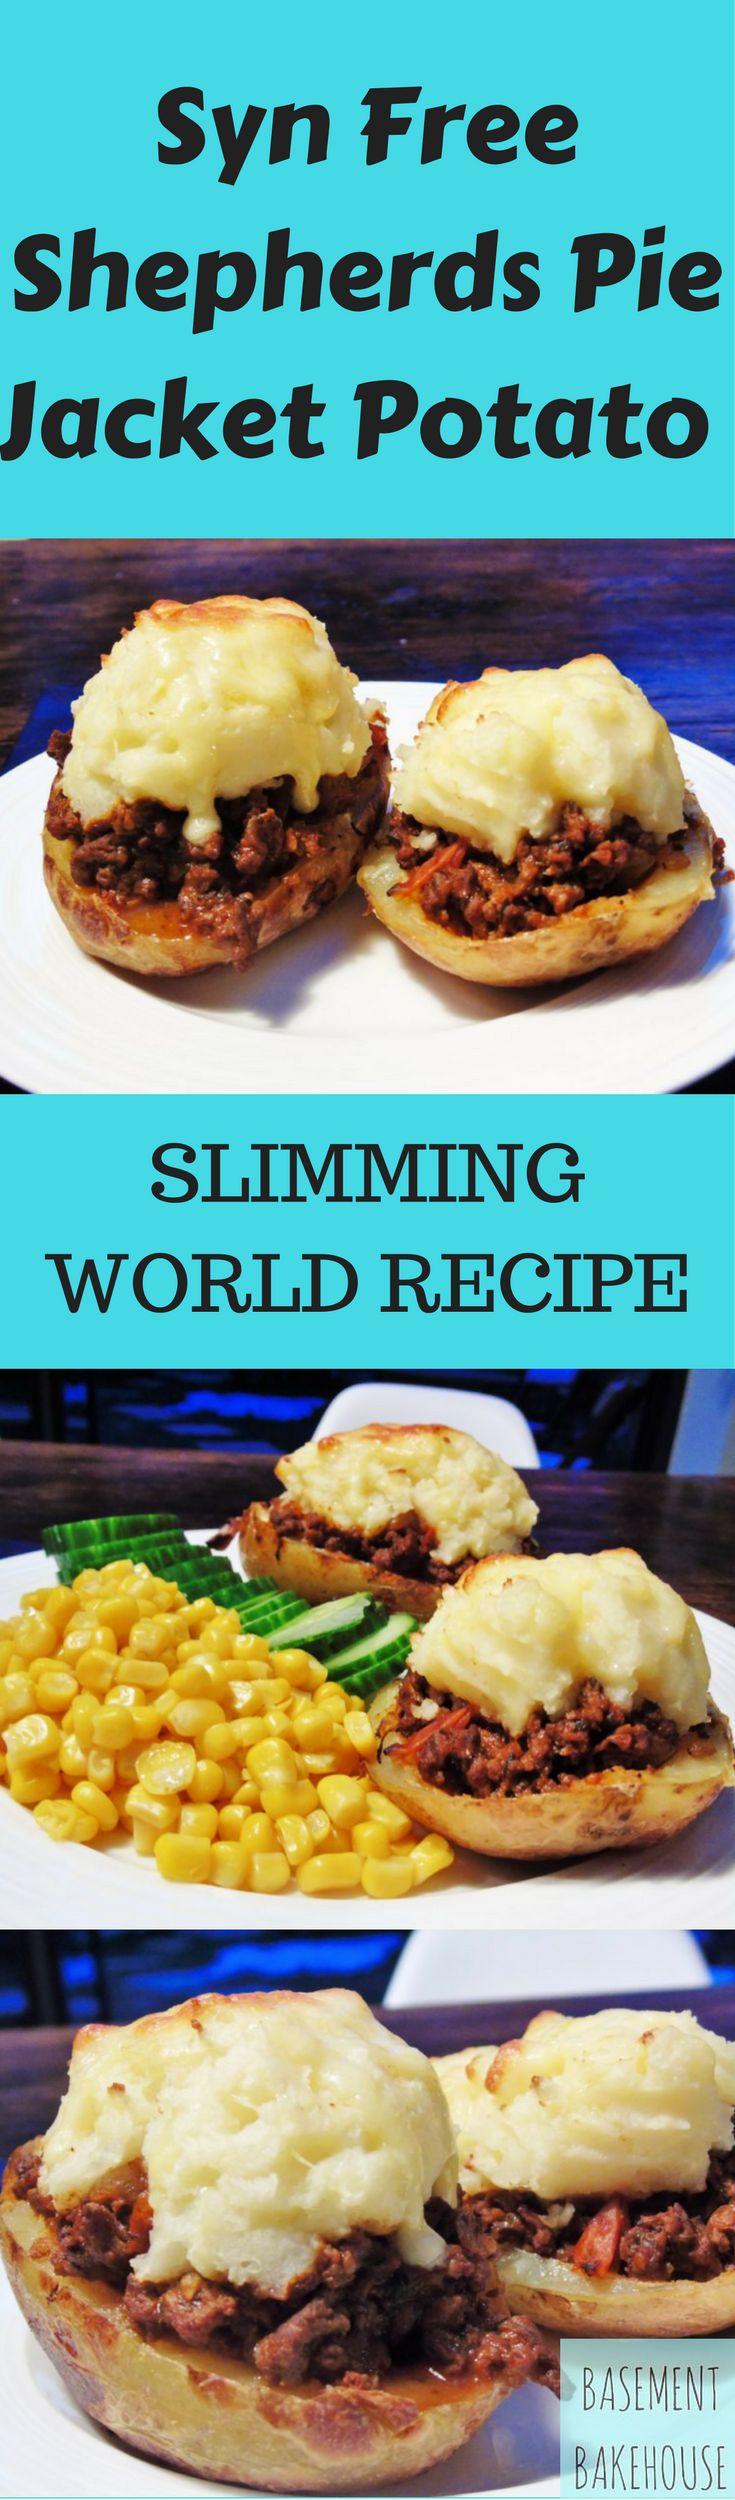 Syn Free Shepherds Pie Jacket Potatoes - Slimming World - Syn  Free - Jacket Potatoes - Easy - Dinner - Recipe